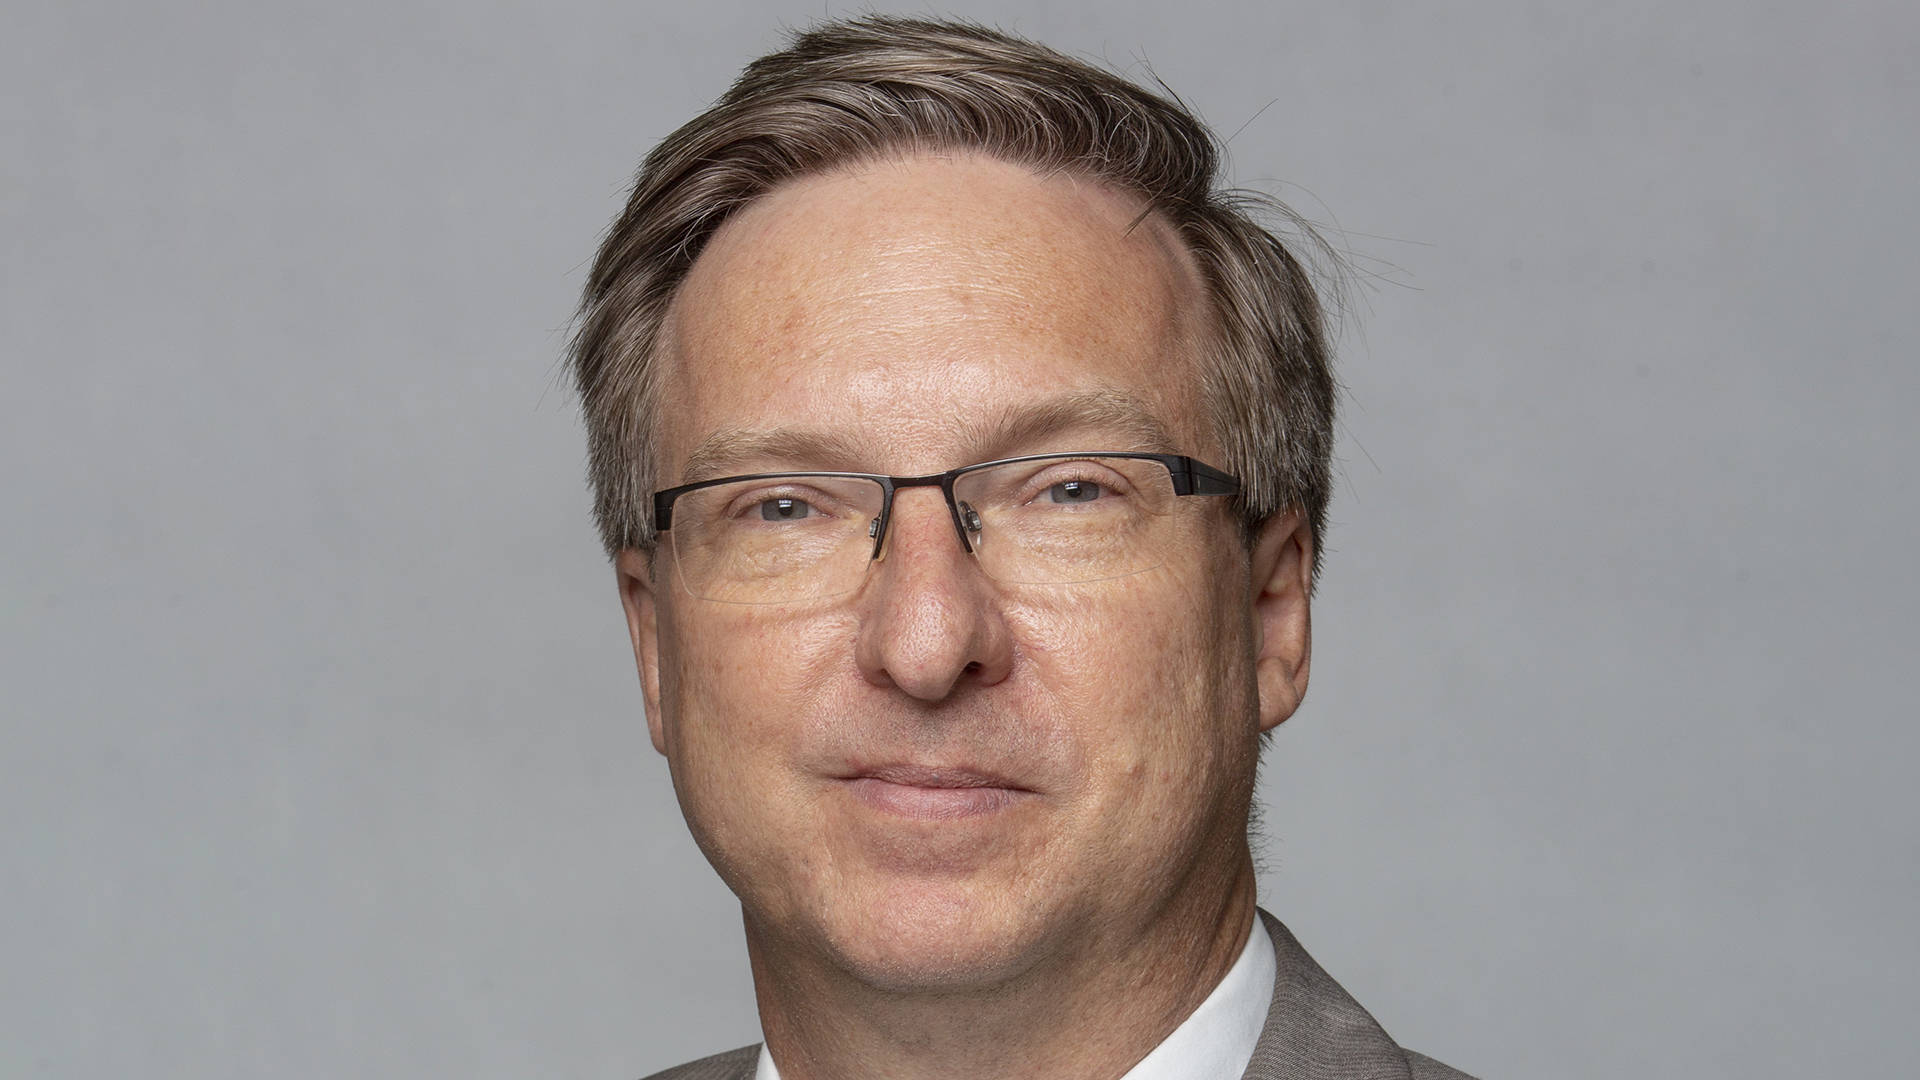 Marcio Weichert, Programme Manager of the DWIH São Paulo